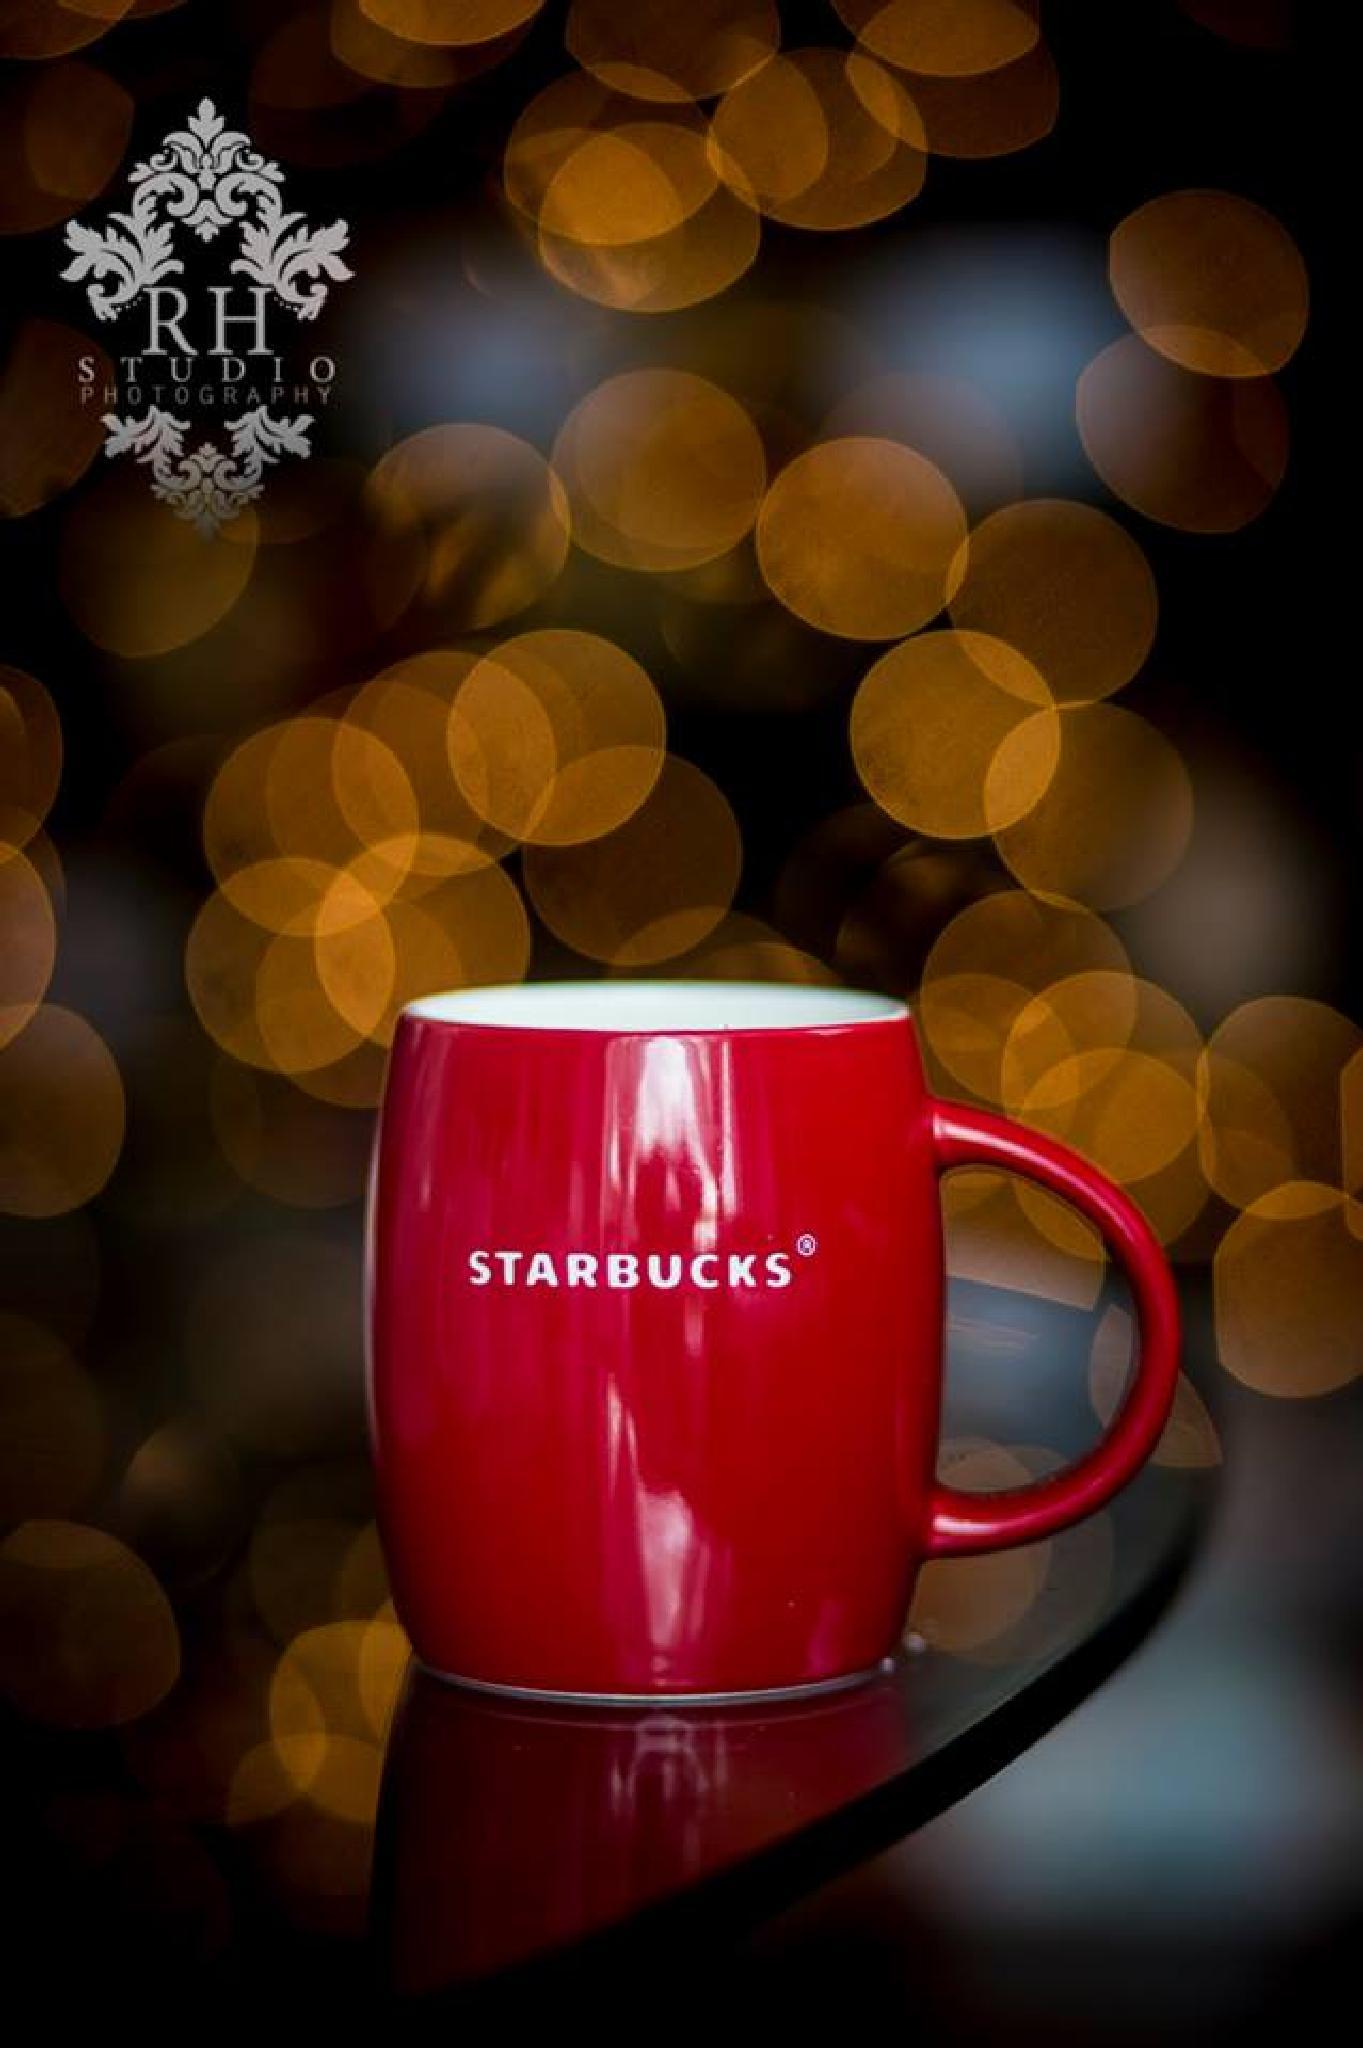 Starbucks Christmas! by RH STudio Photography